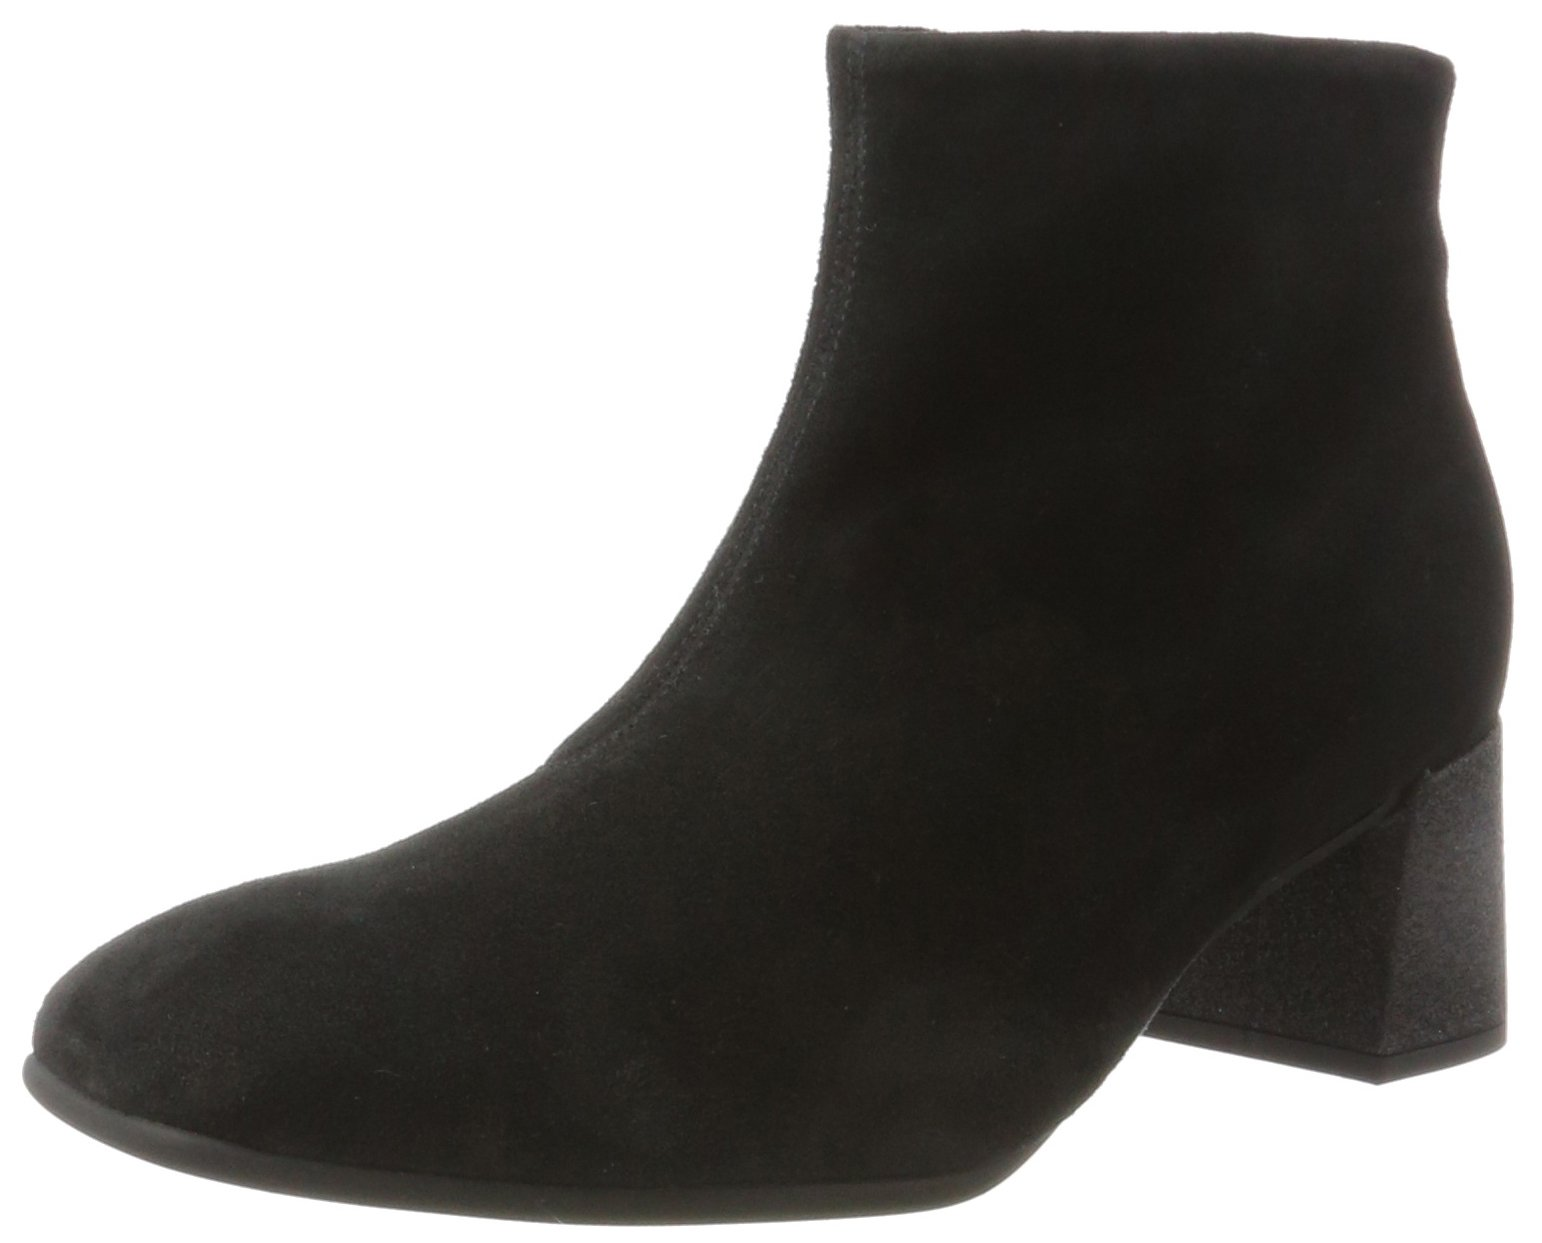 Shoes Schwarz39 Eu BasicBottes Gabor FemmeNoir31 nwP0Ok